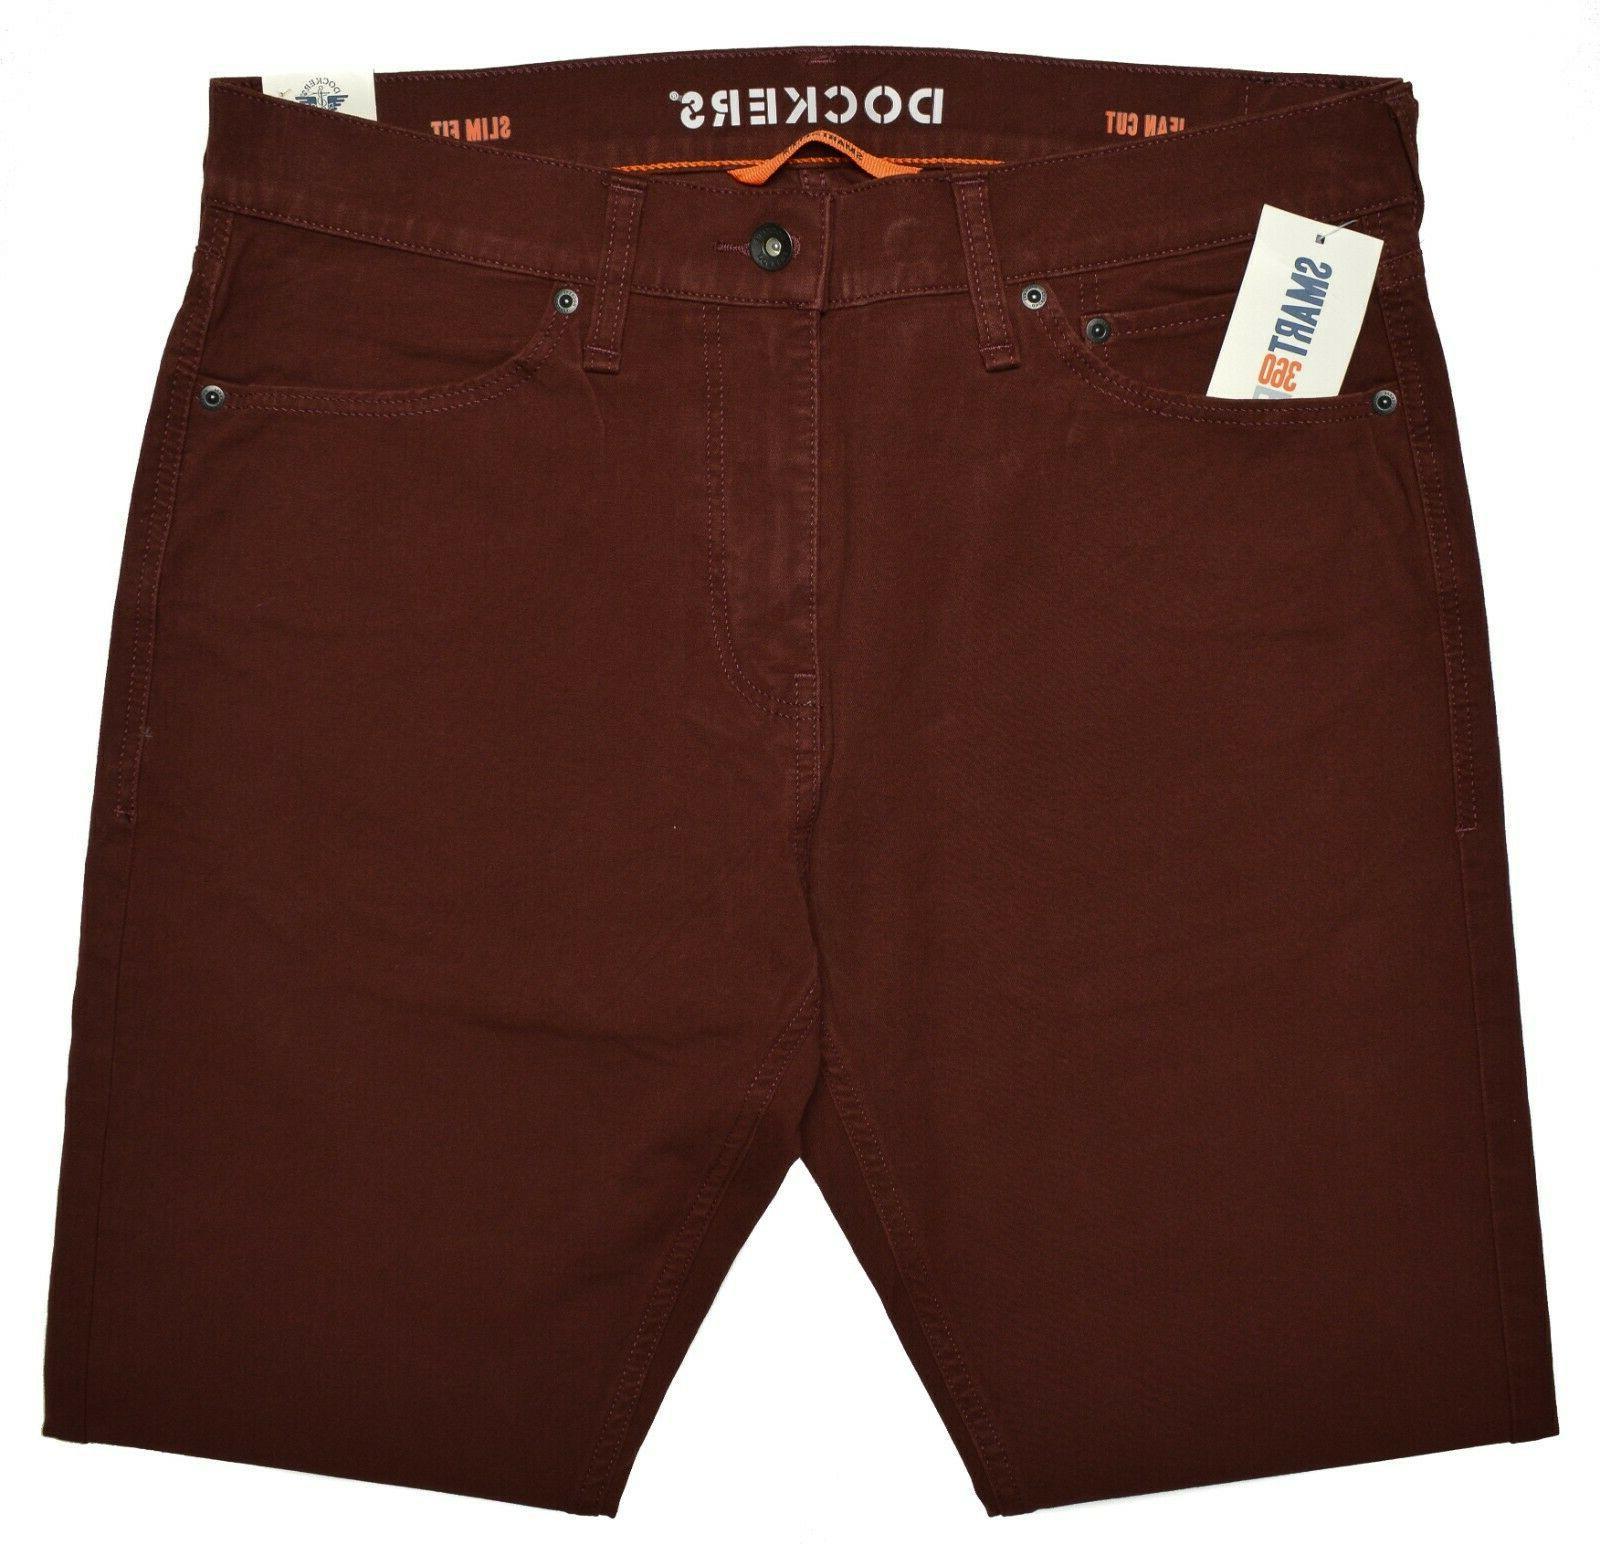 Dockers #10318 Flat Front Ultimate Jean Cut Pants MSRP $66